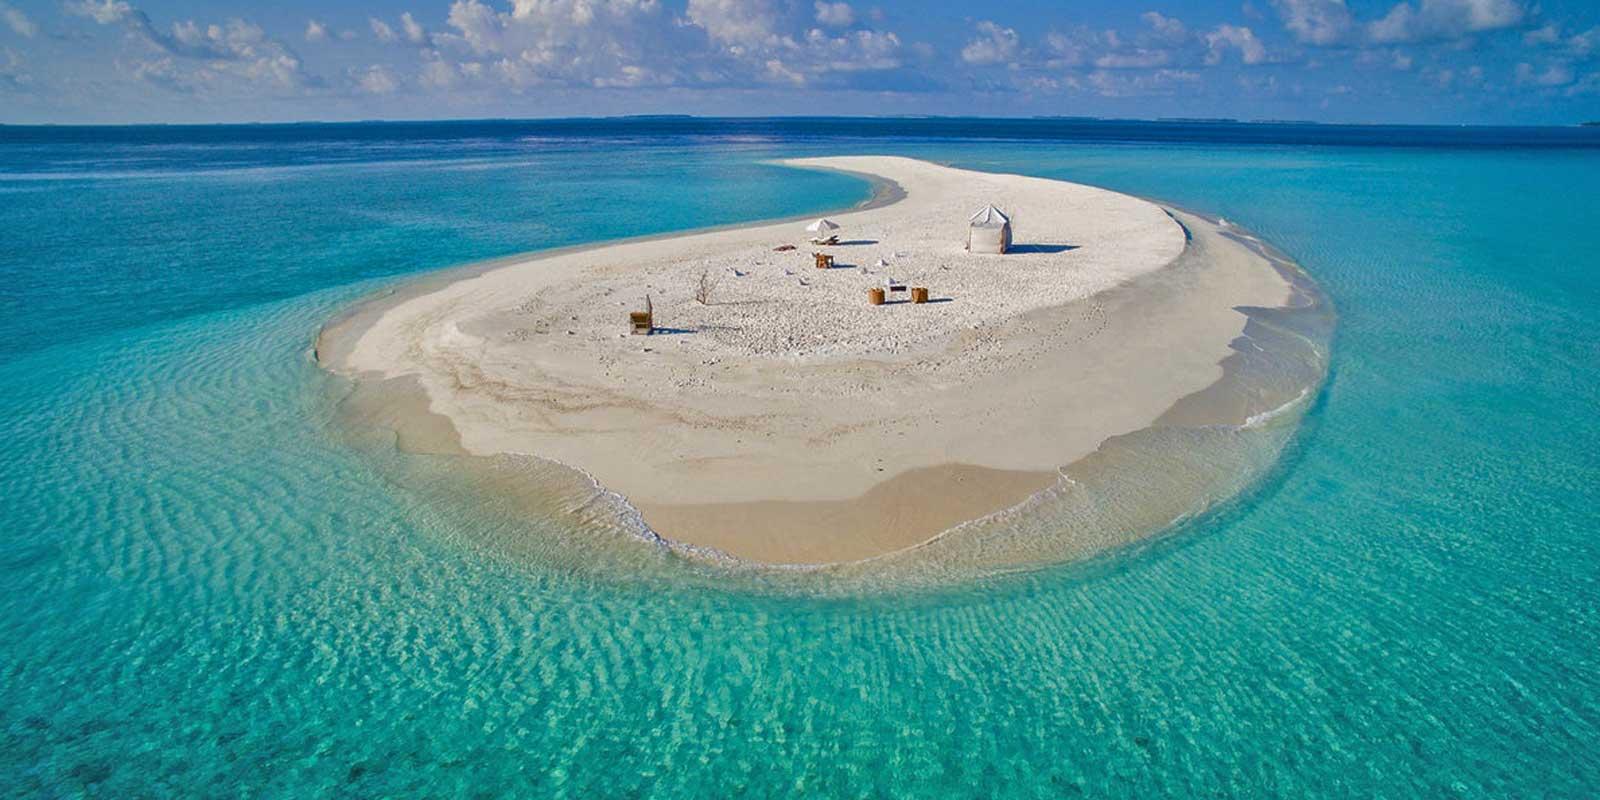 OCOA_SONEVA_FUSHI_RESORT_MALDIVES_9